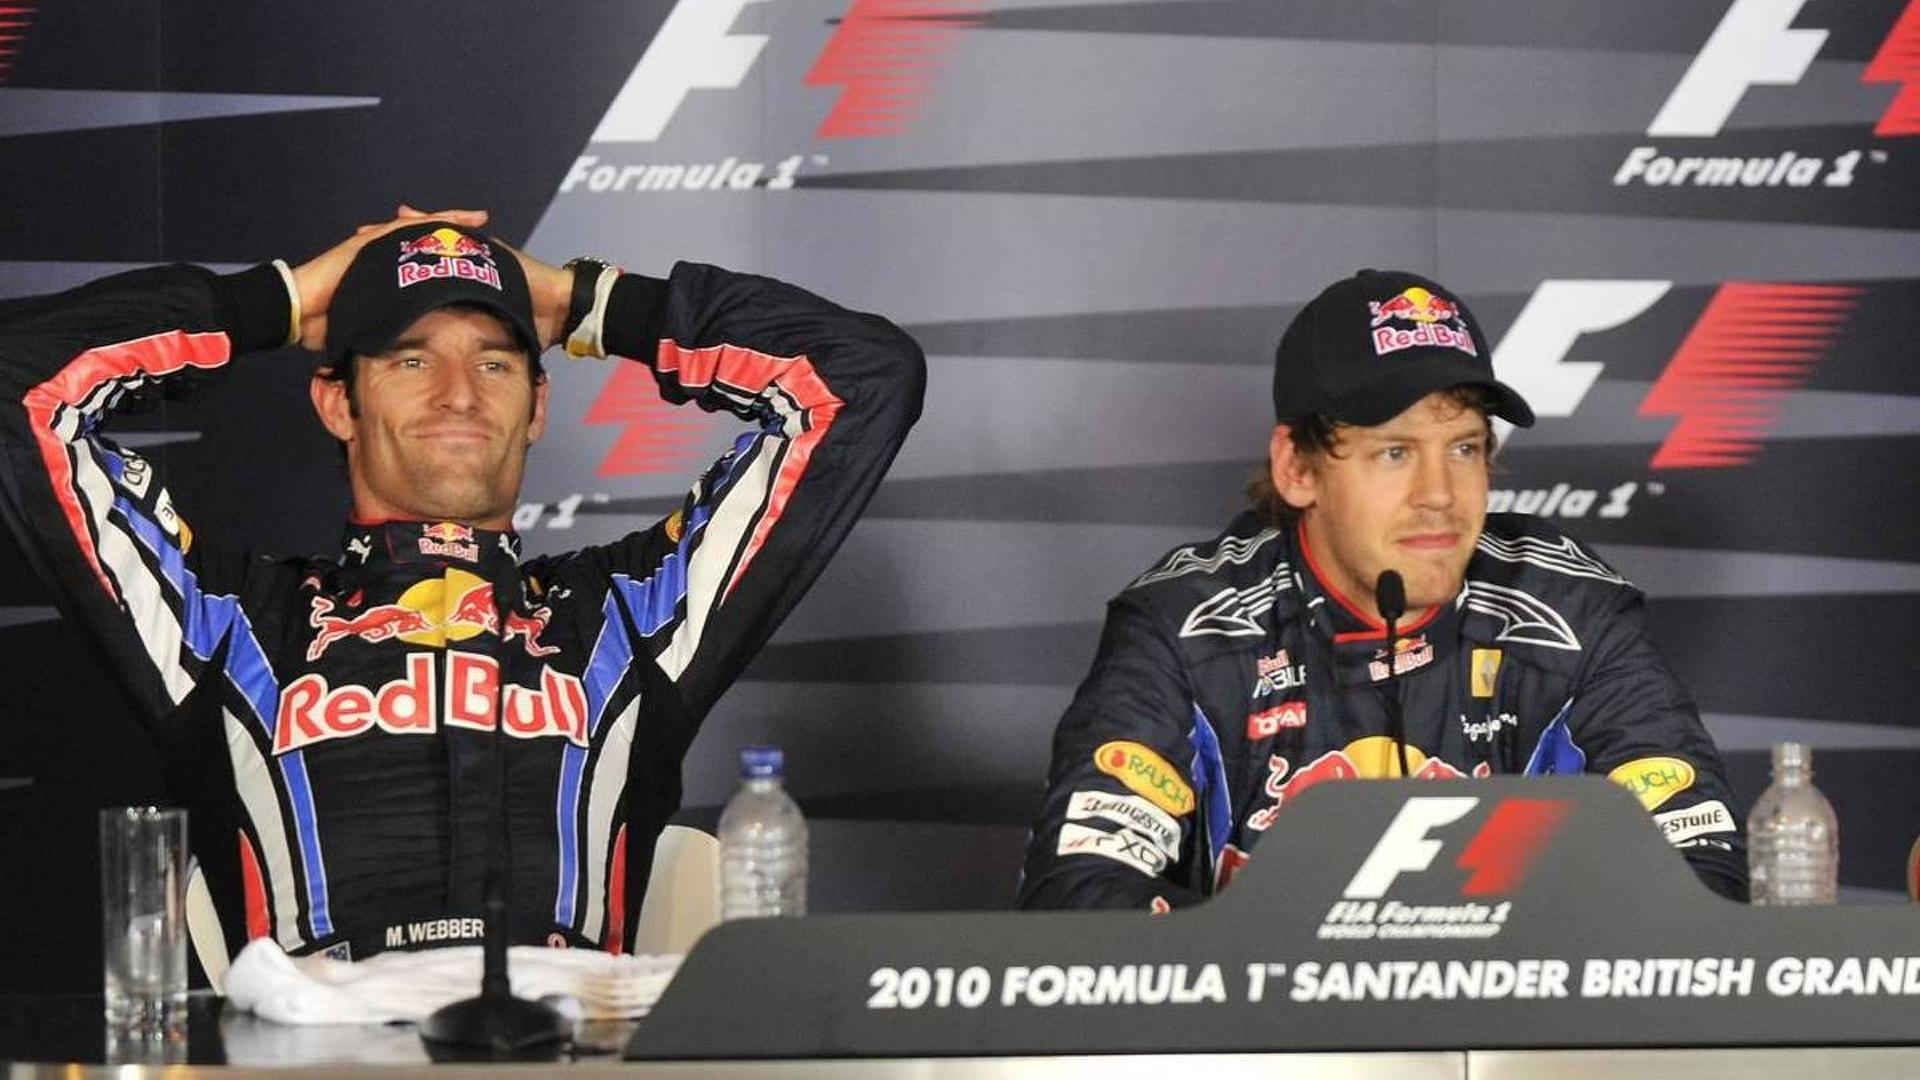 Angry Webber not set to leave Red Bull - Horner